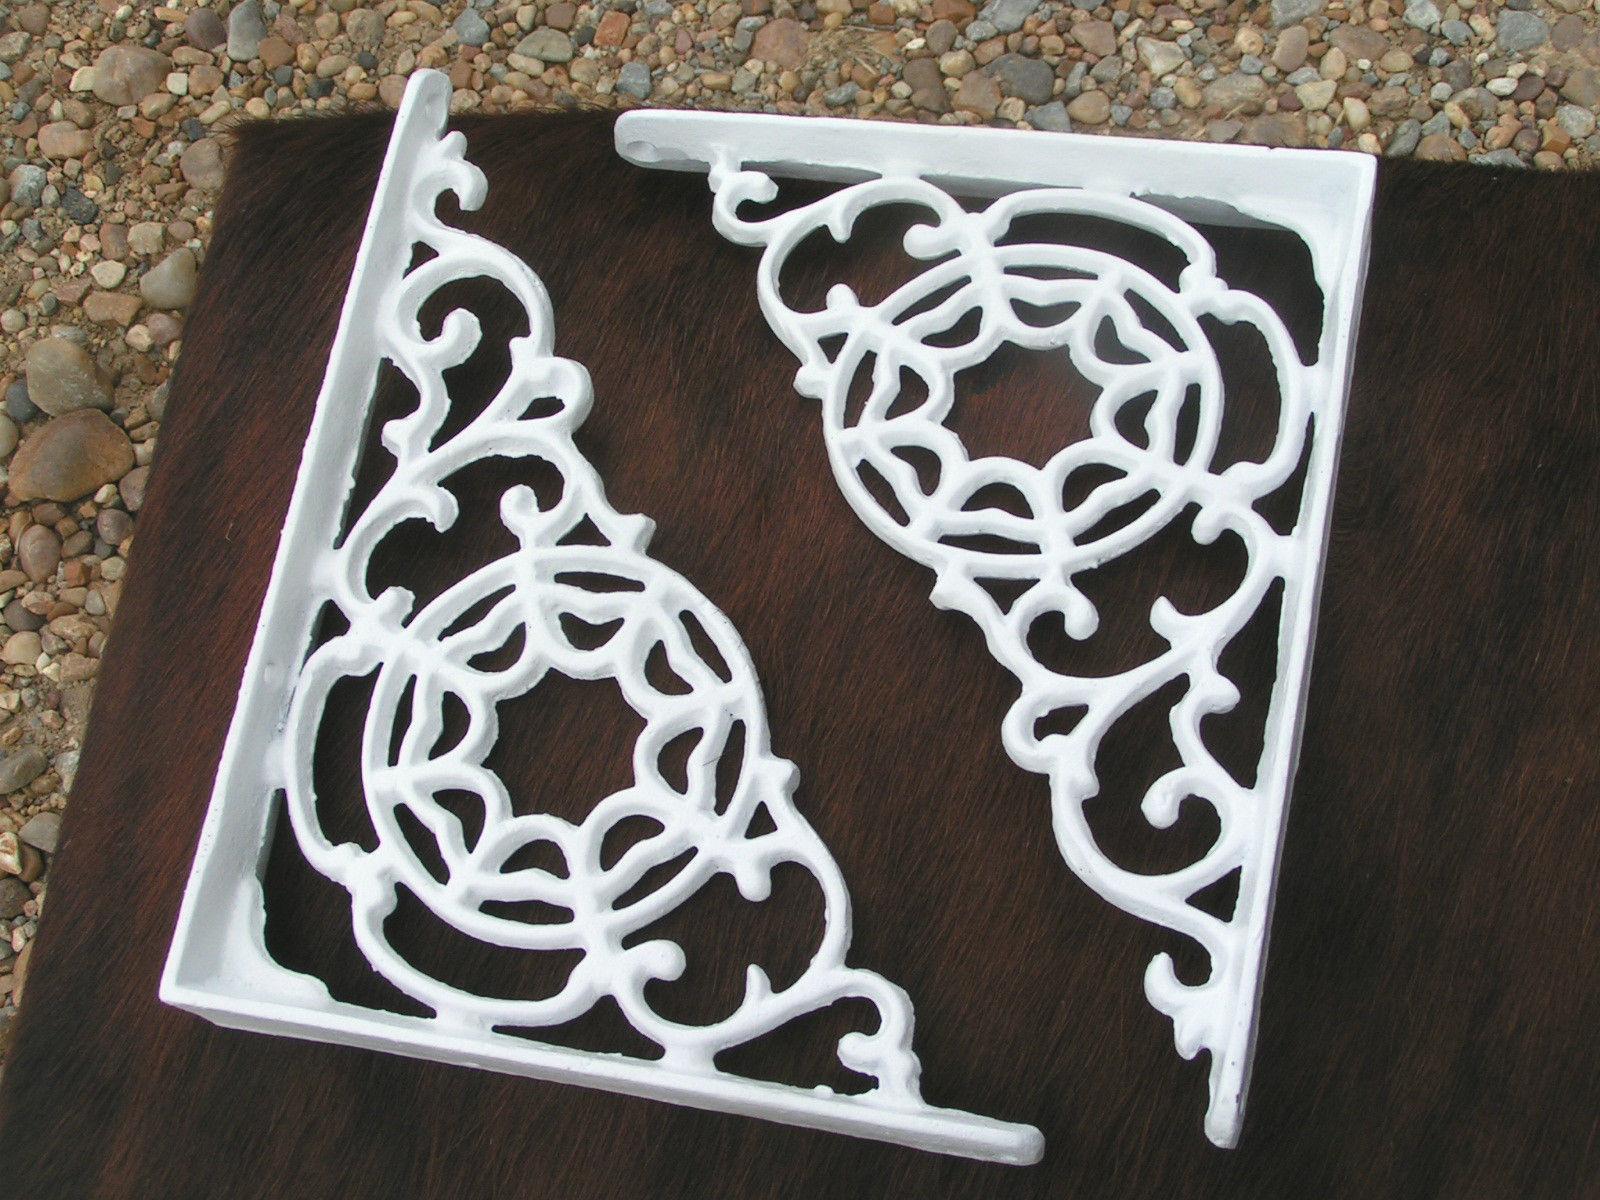 2 Cast Iron Brackets Wall Shelf Island Architectural corbels braces white bz